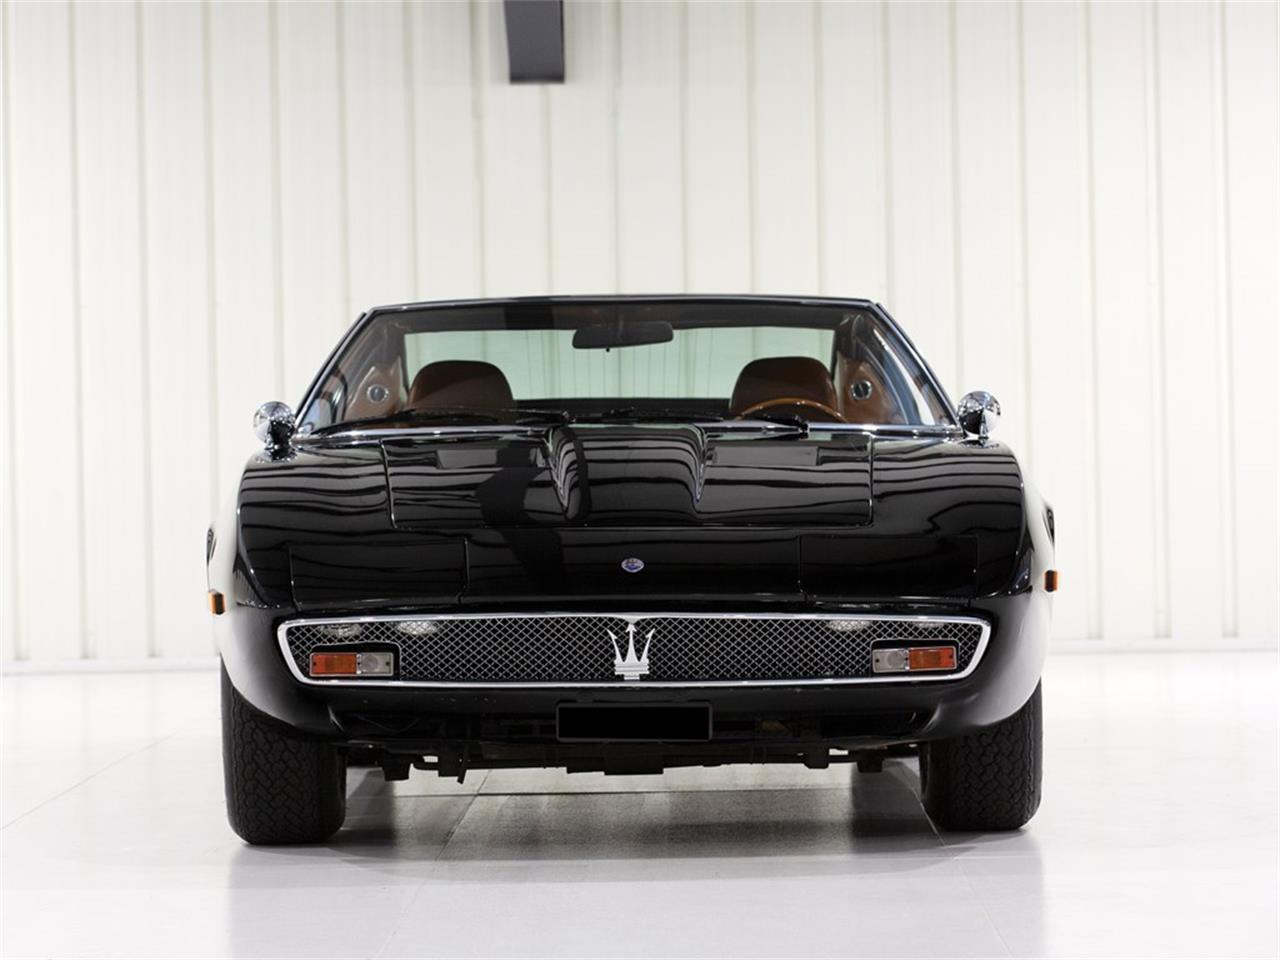 1971 Maserati Ghibli (CC-1309456) for sale in Paris, France